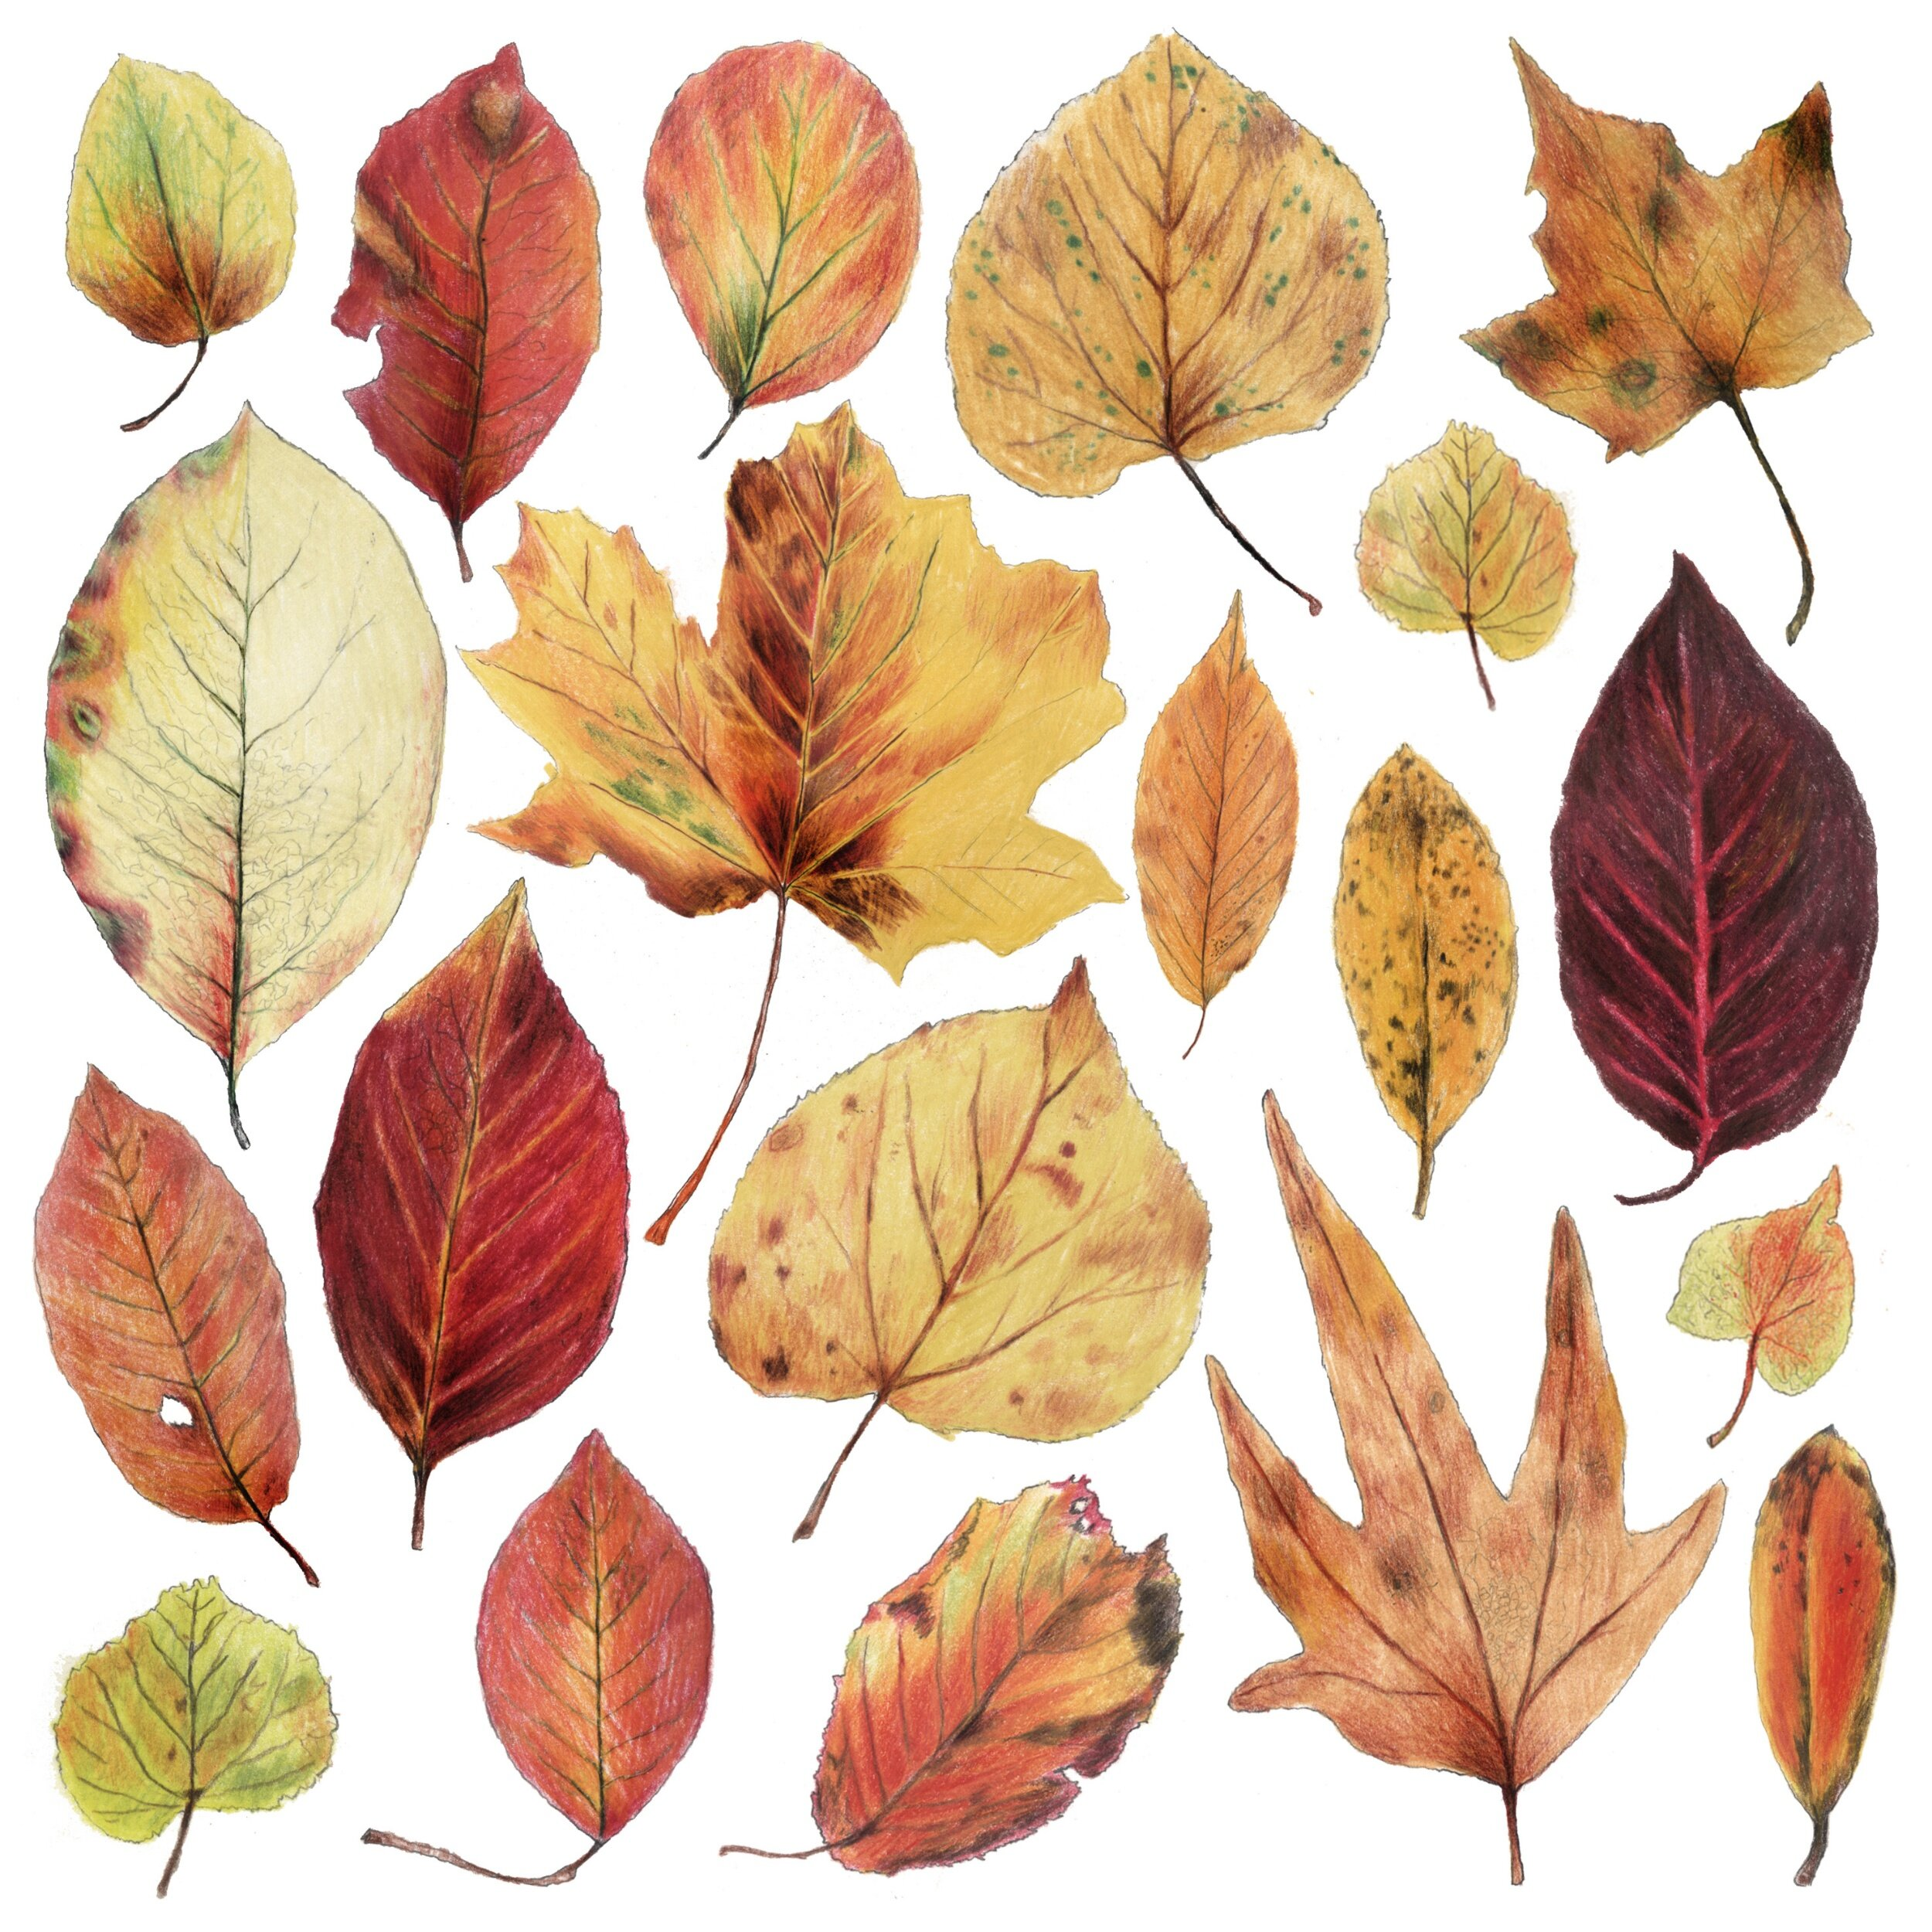 processed_autumn.jpg